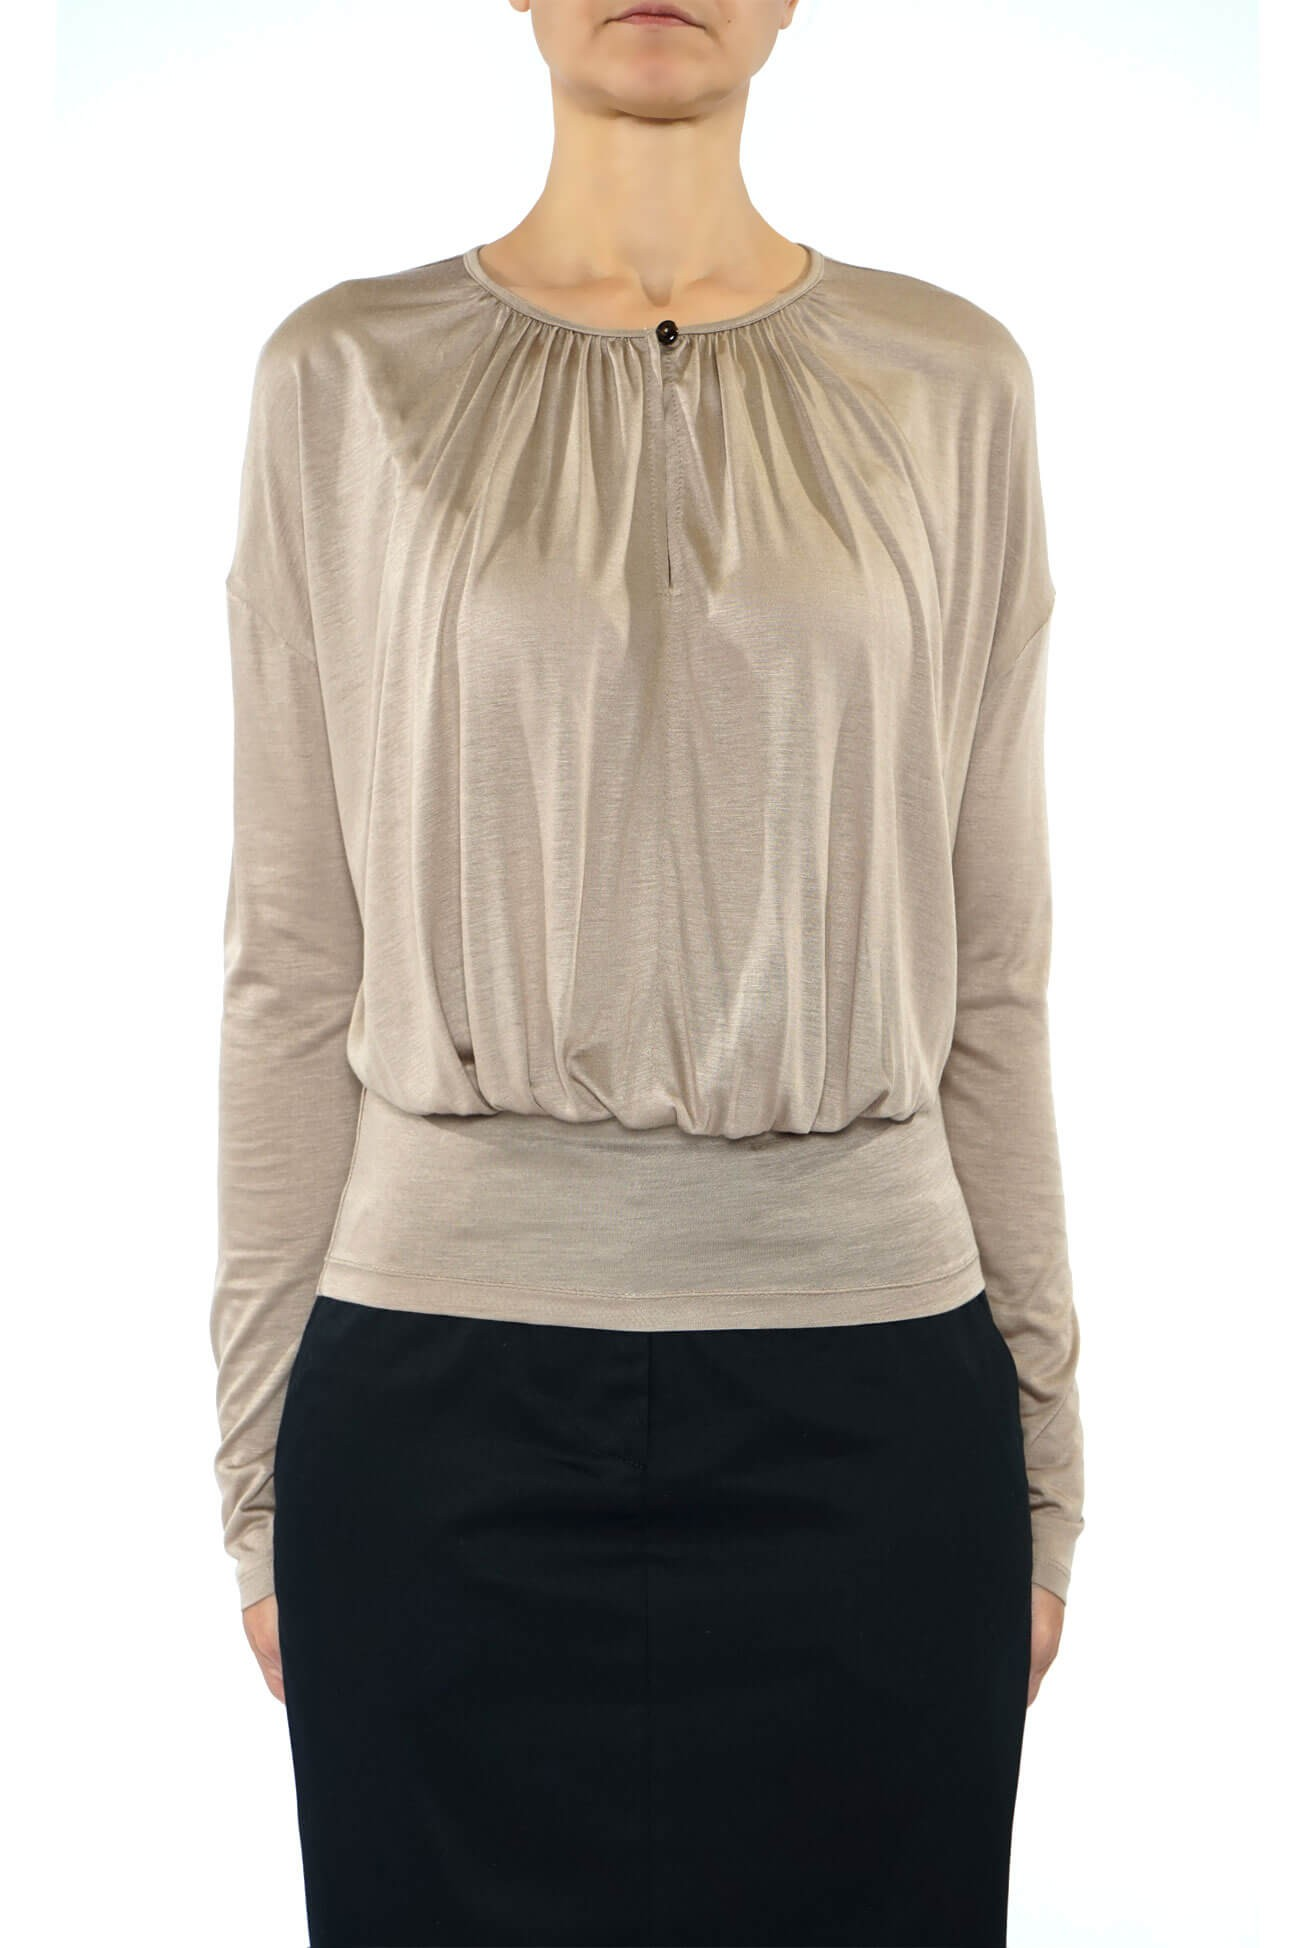 bluza din vascoza cu pliuri pe bust